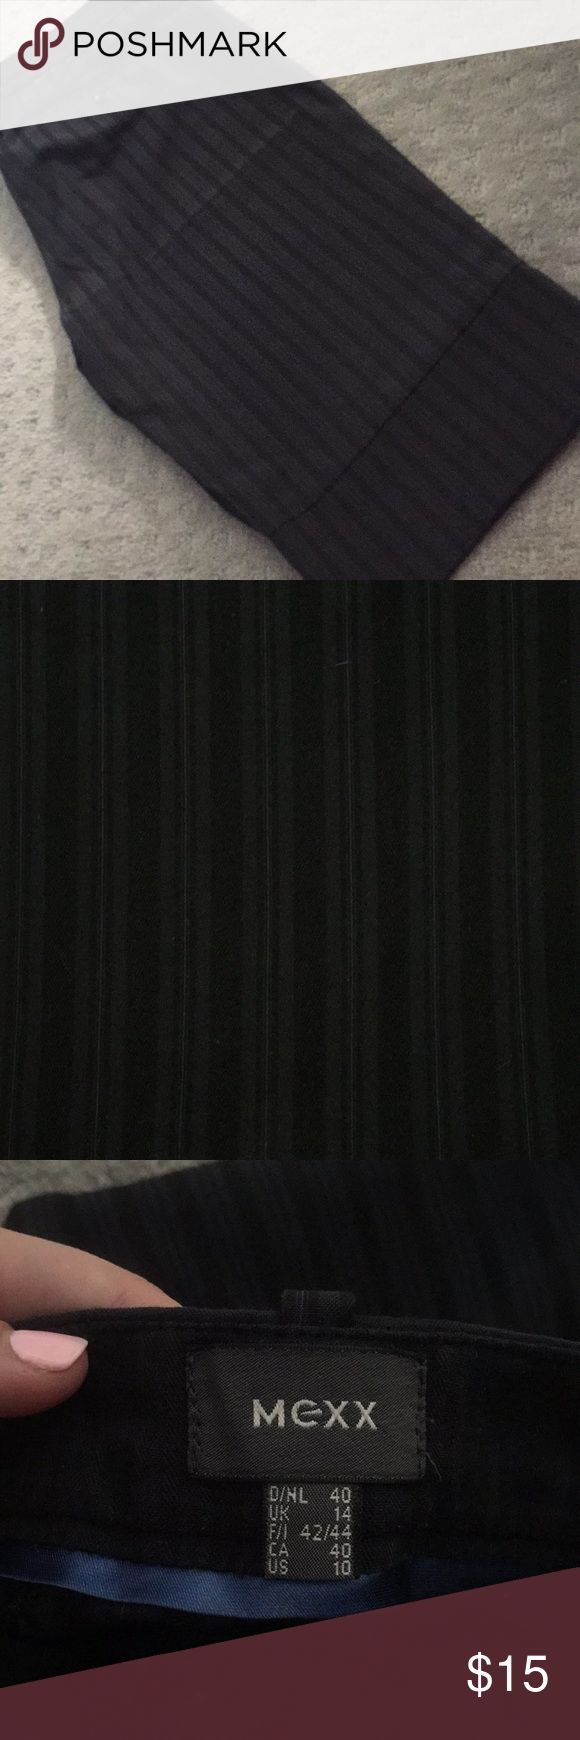 Mexx dress up Capri slacks Dress up slacks. Navy blue stripped w/black. Side and back buttons. Mexx Pants Capris